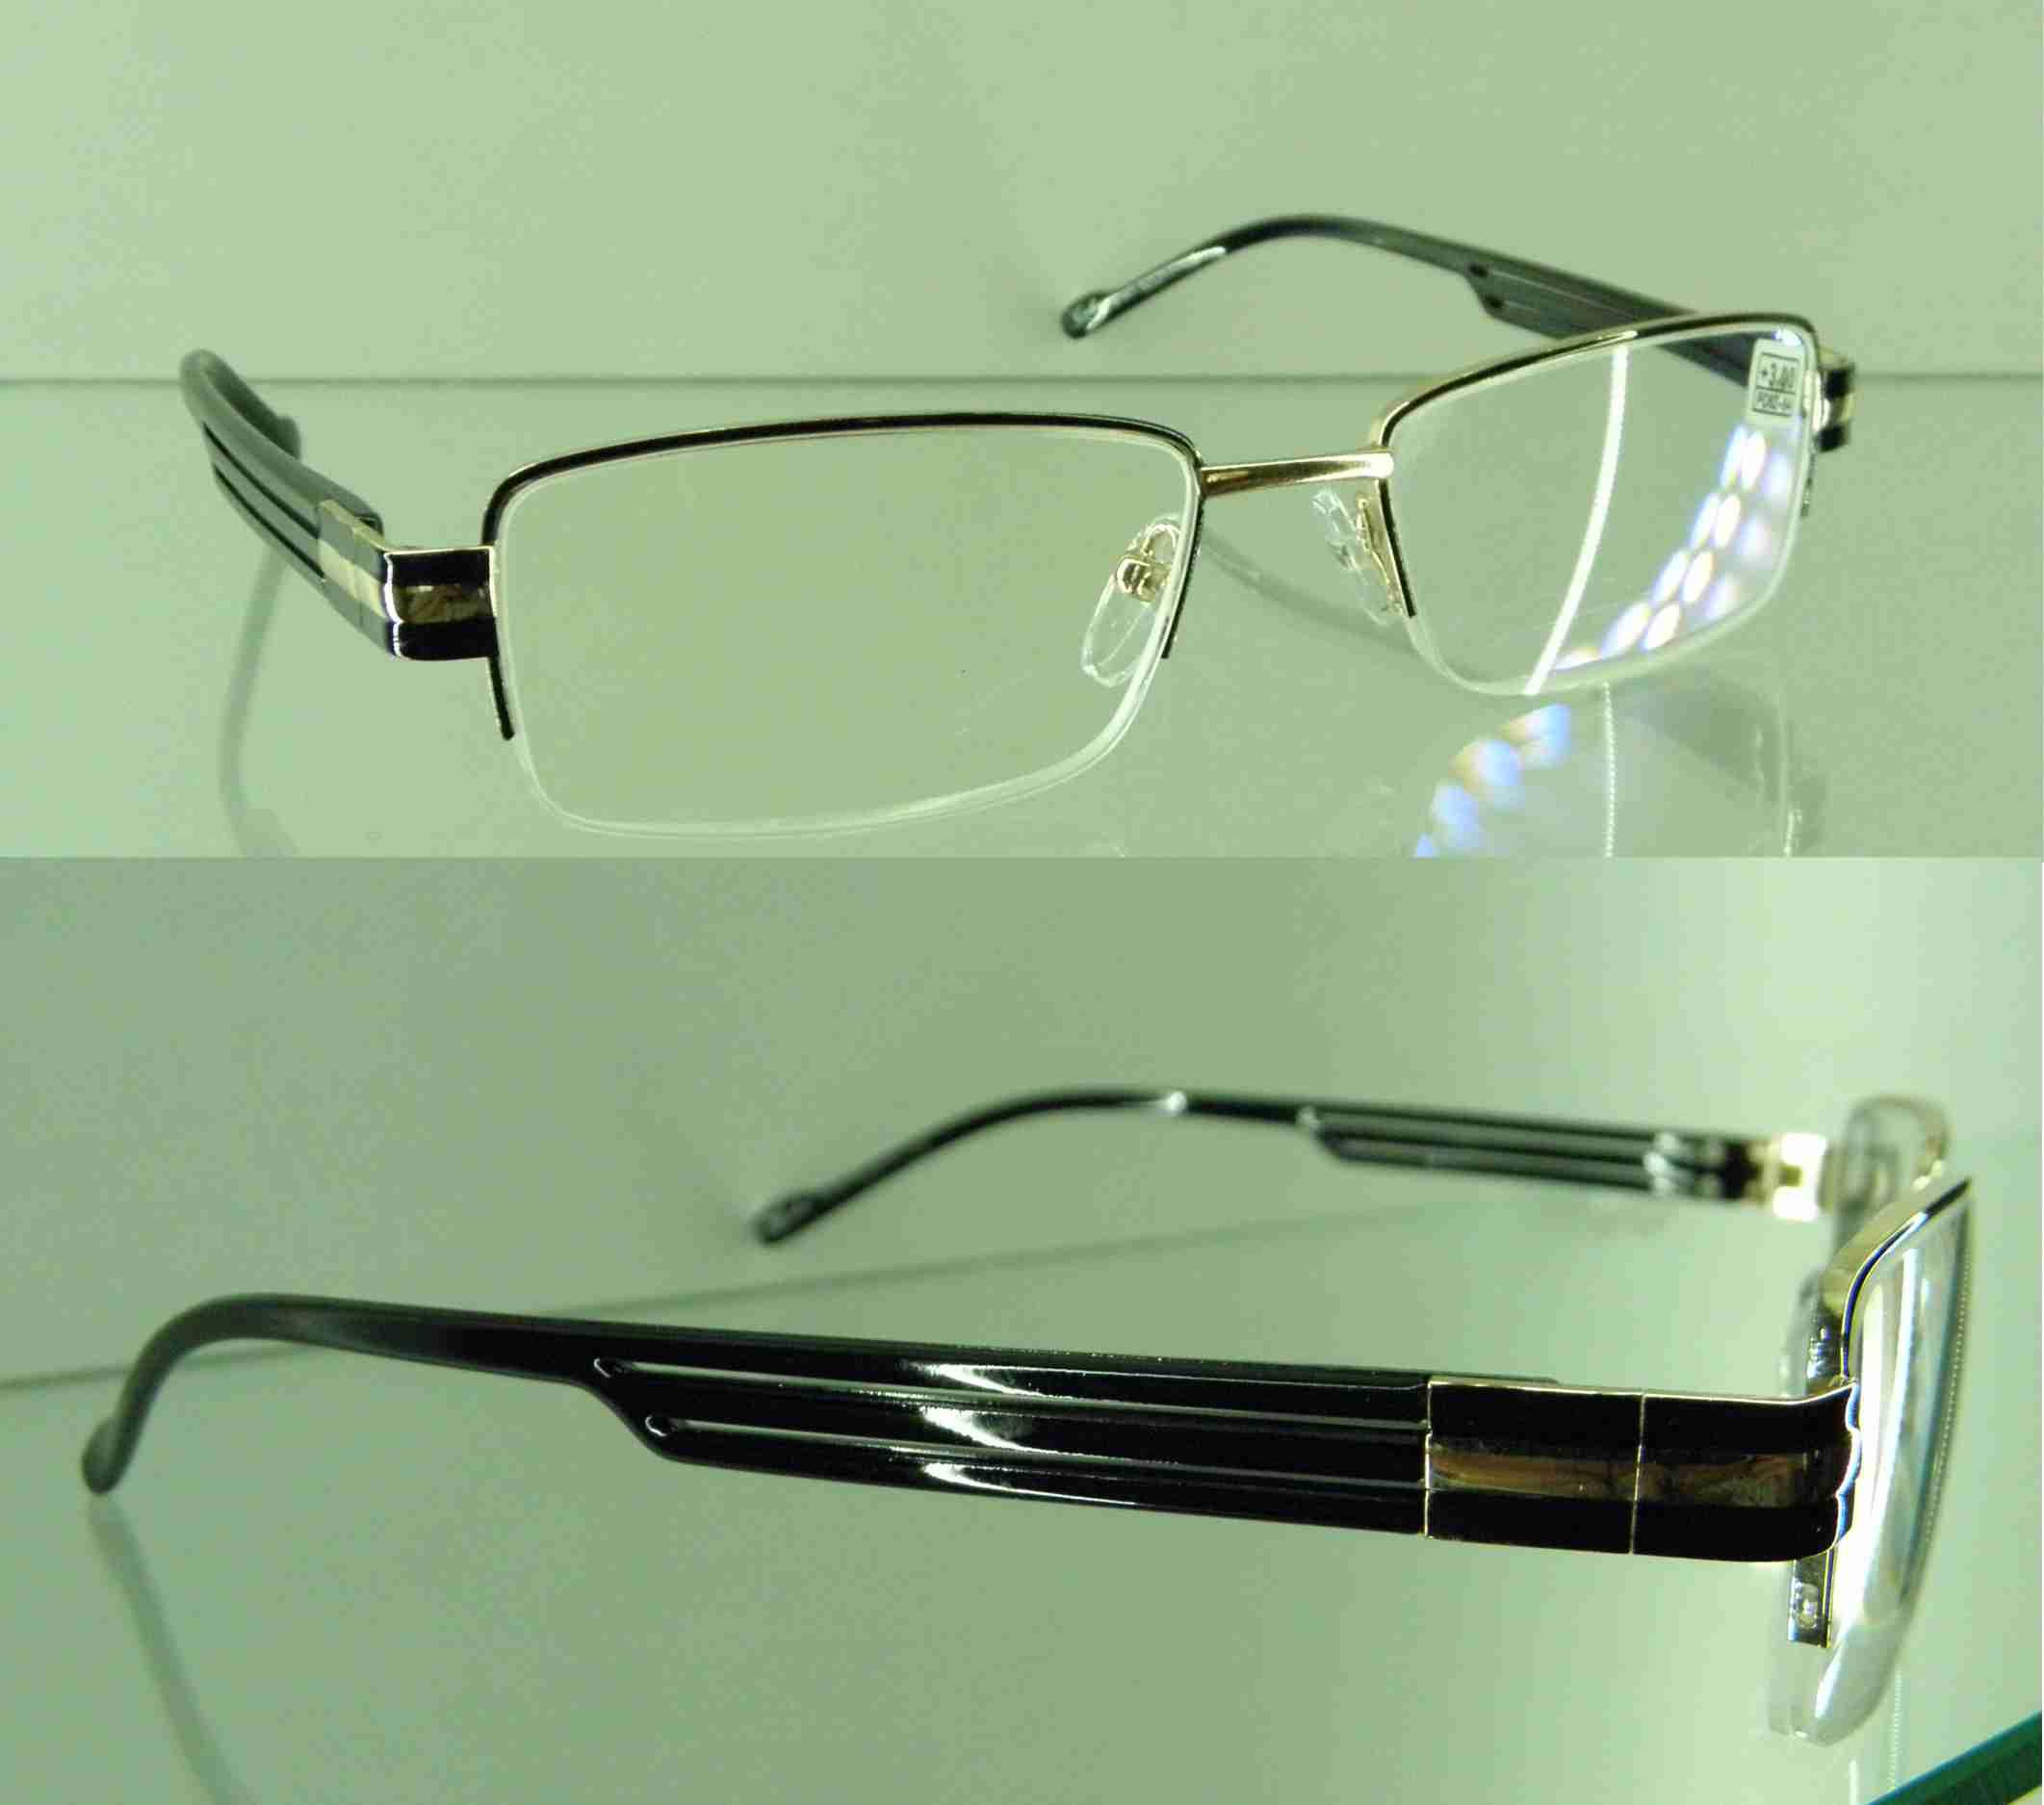 Optic Medical - Модель «Престиж М» a2abd4bb708a7